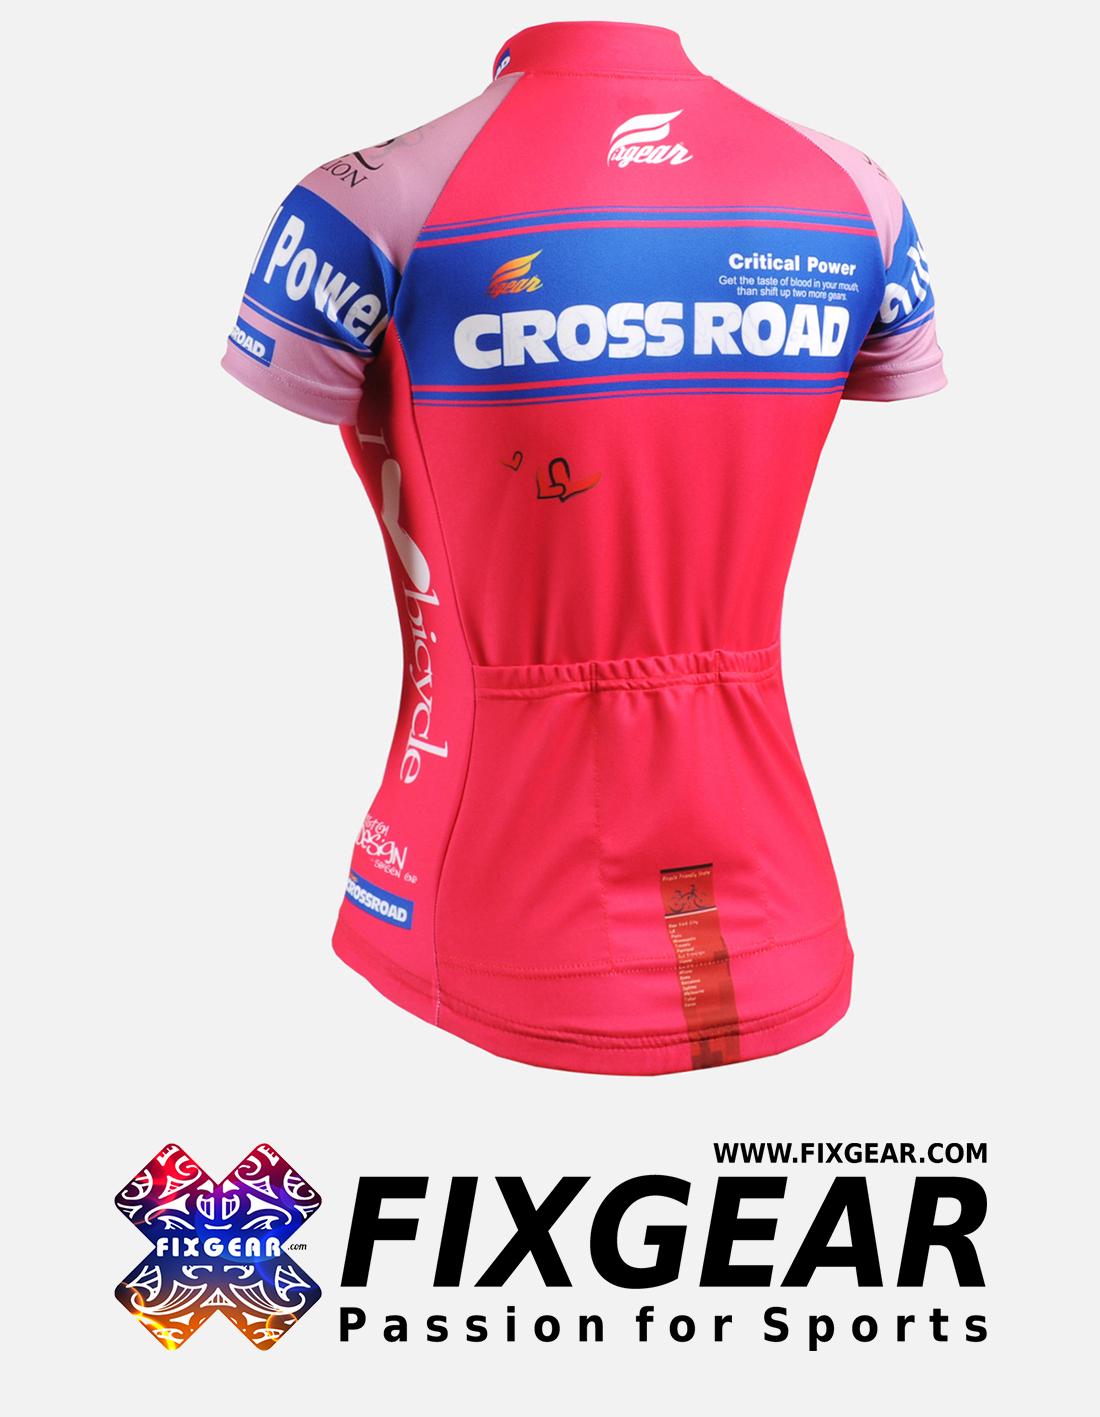 FIXGEAR CS-W7P2 Women's Short Sleeve Jersey